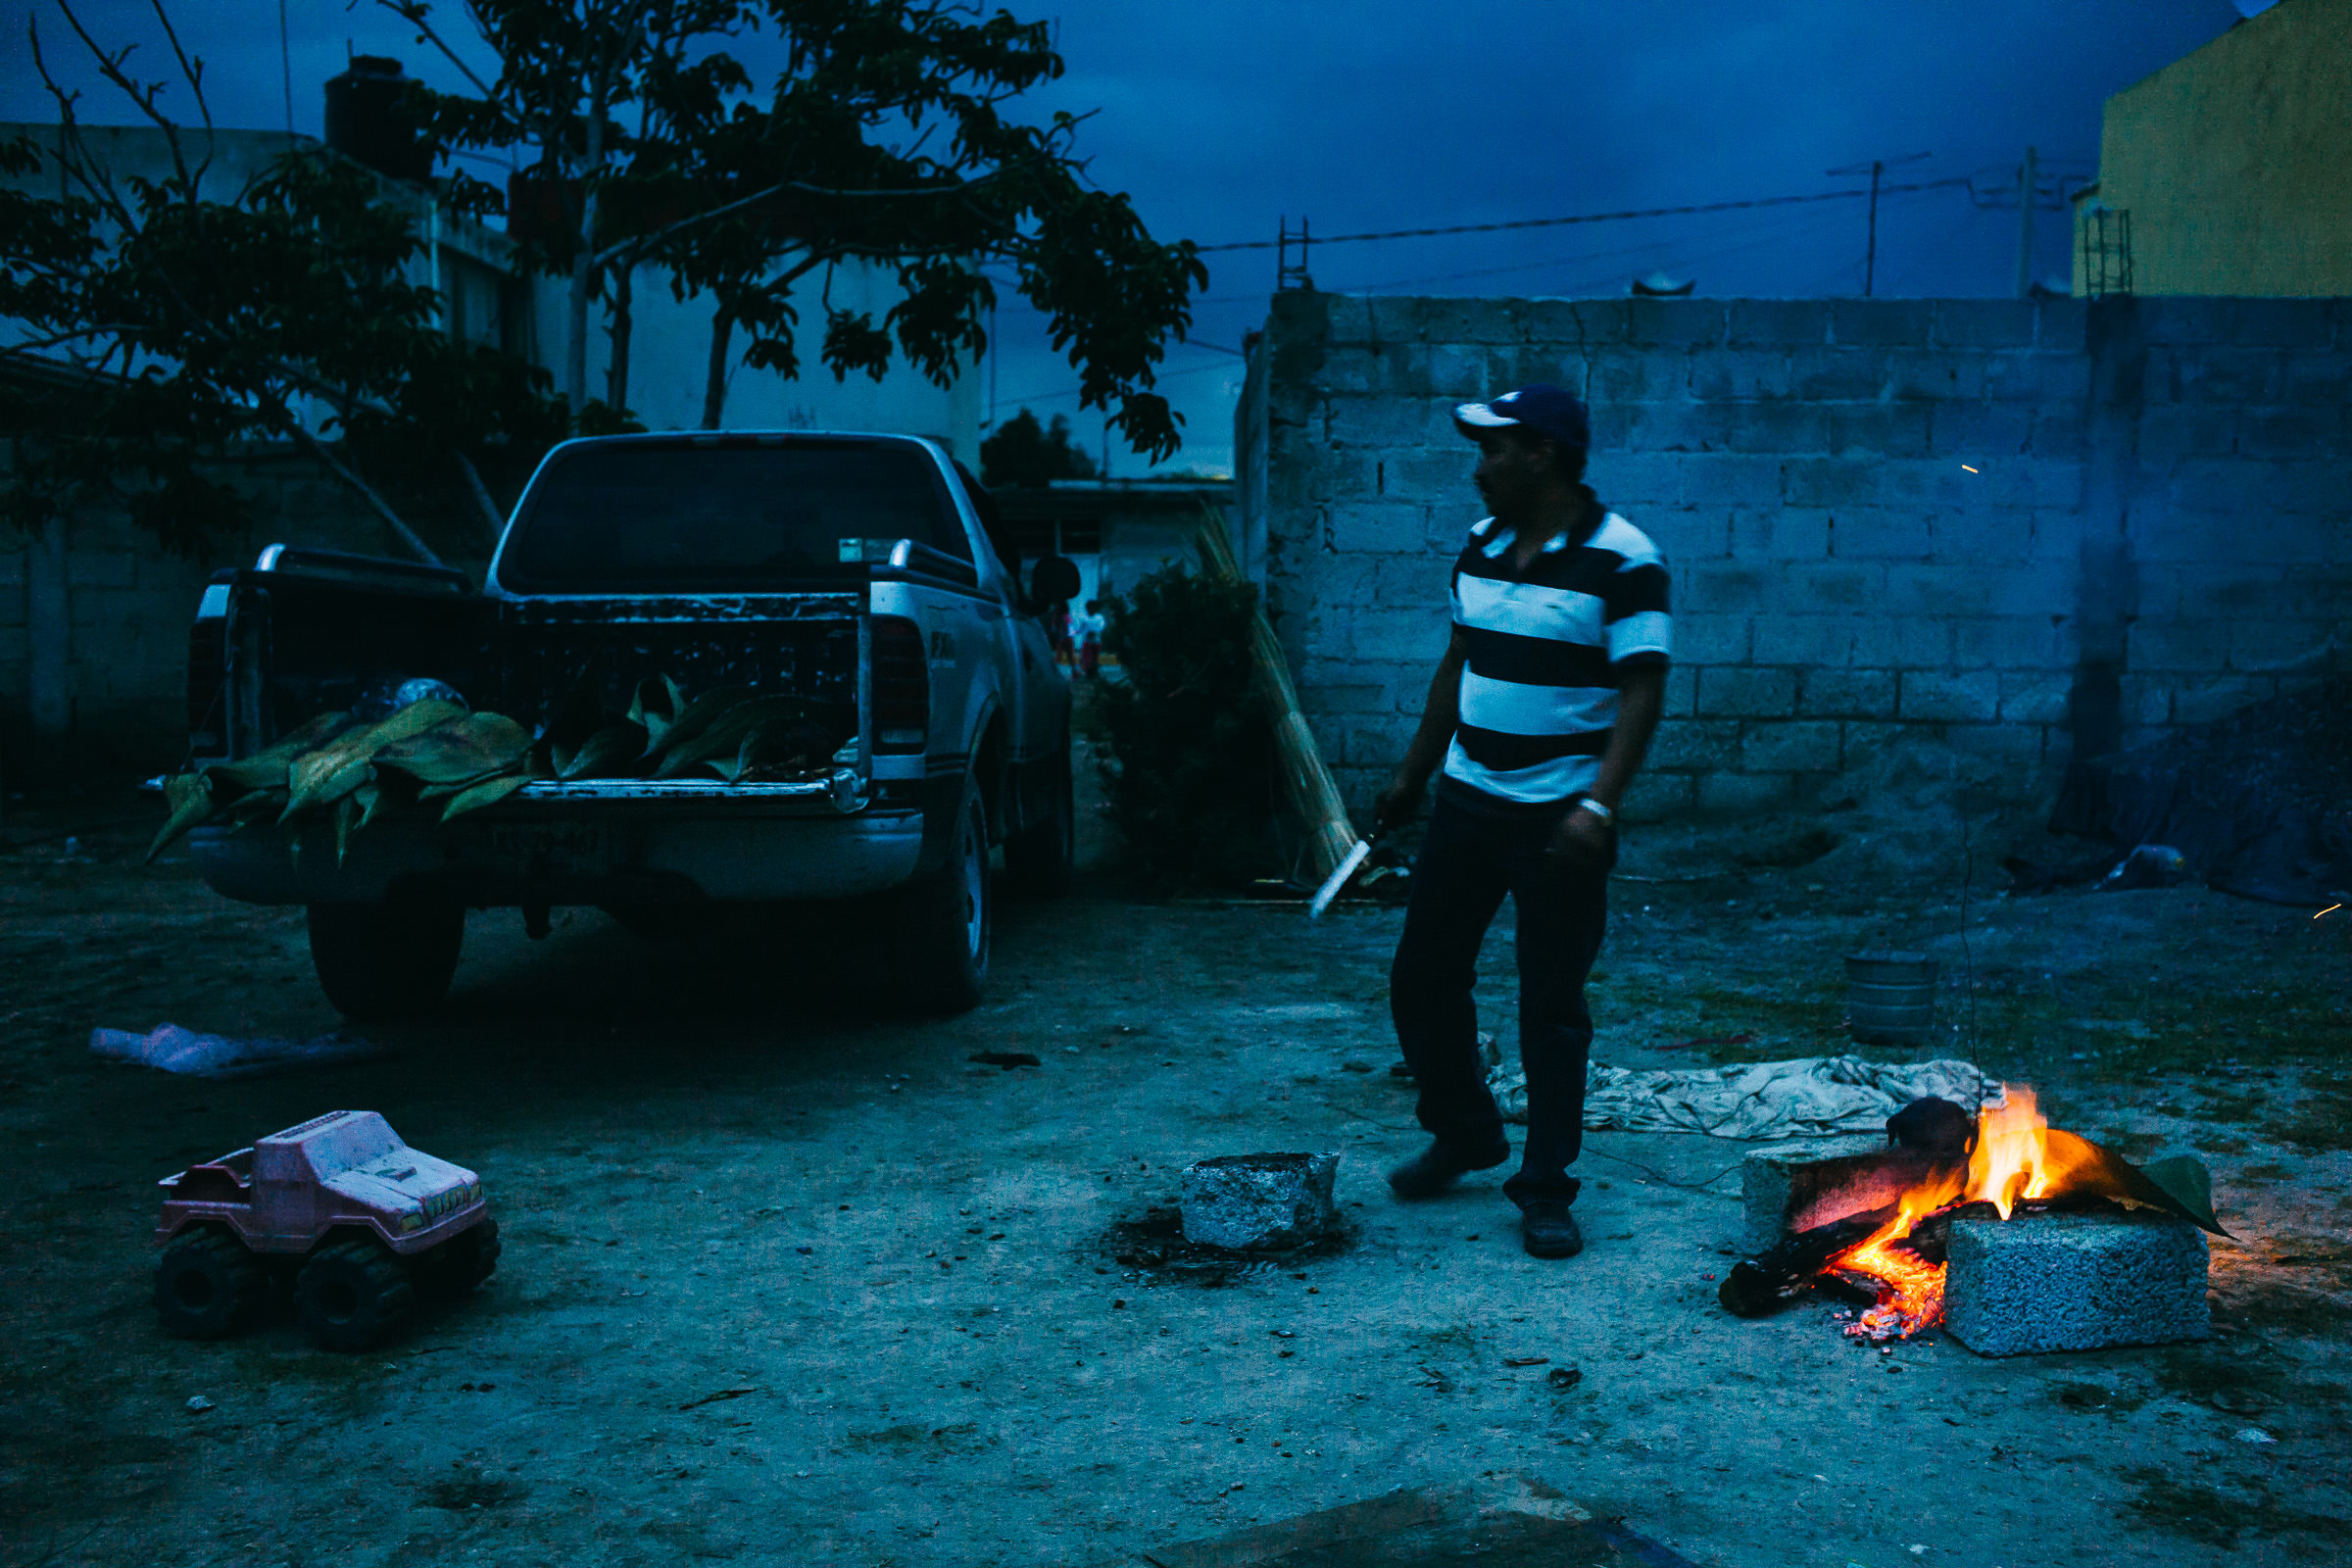 brandon_patoc_travel_photographer_in_mexico_0008.jpg